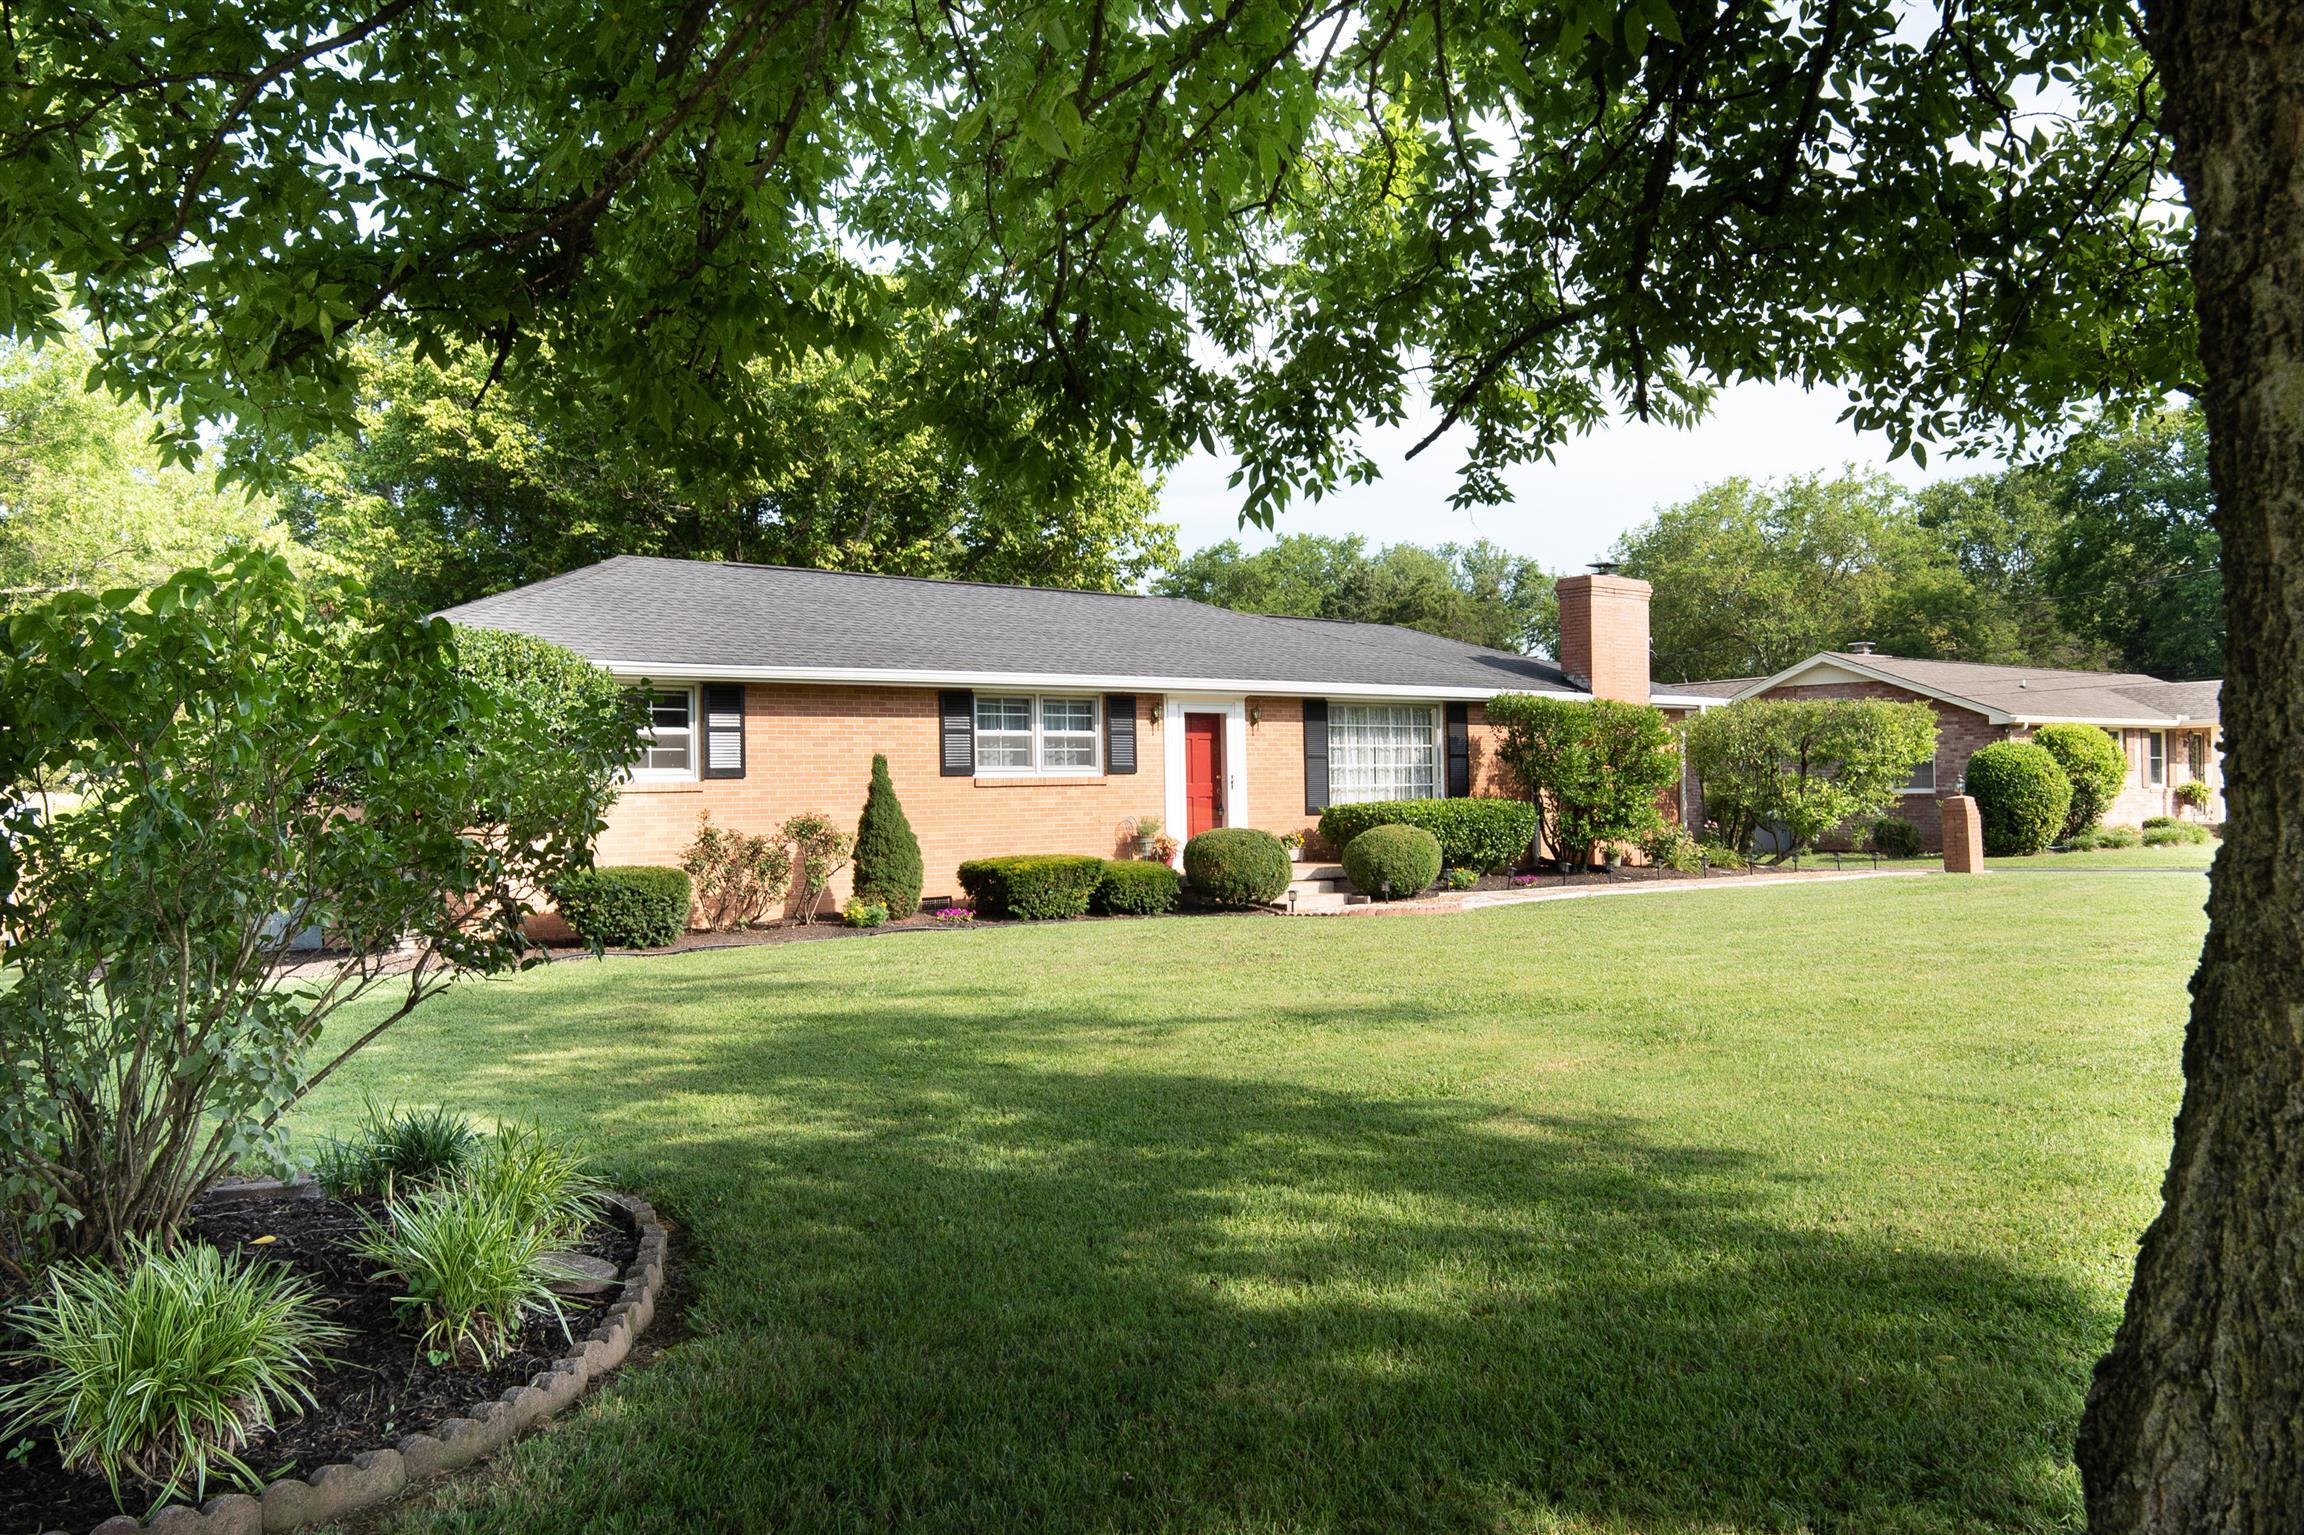 104 Bartonwood Dr, Lebanon, TN 37087 - Lebanon, TN real estate listing